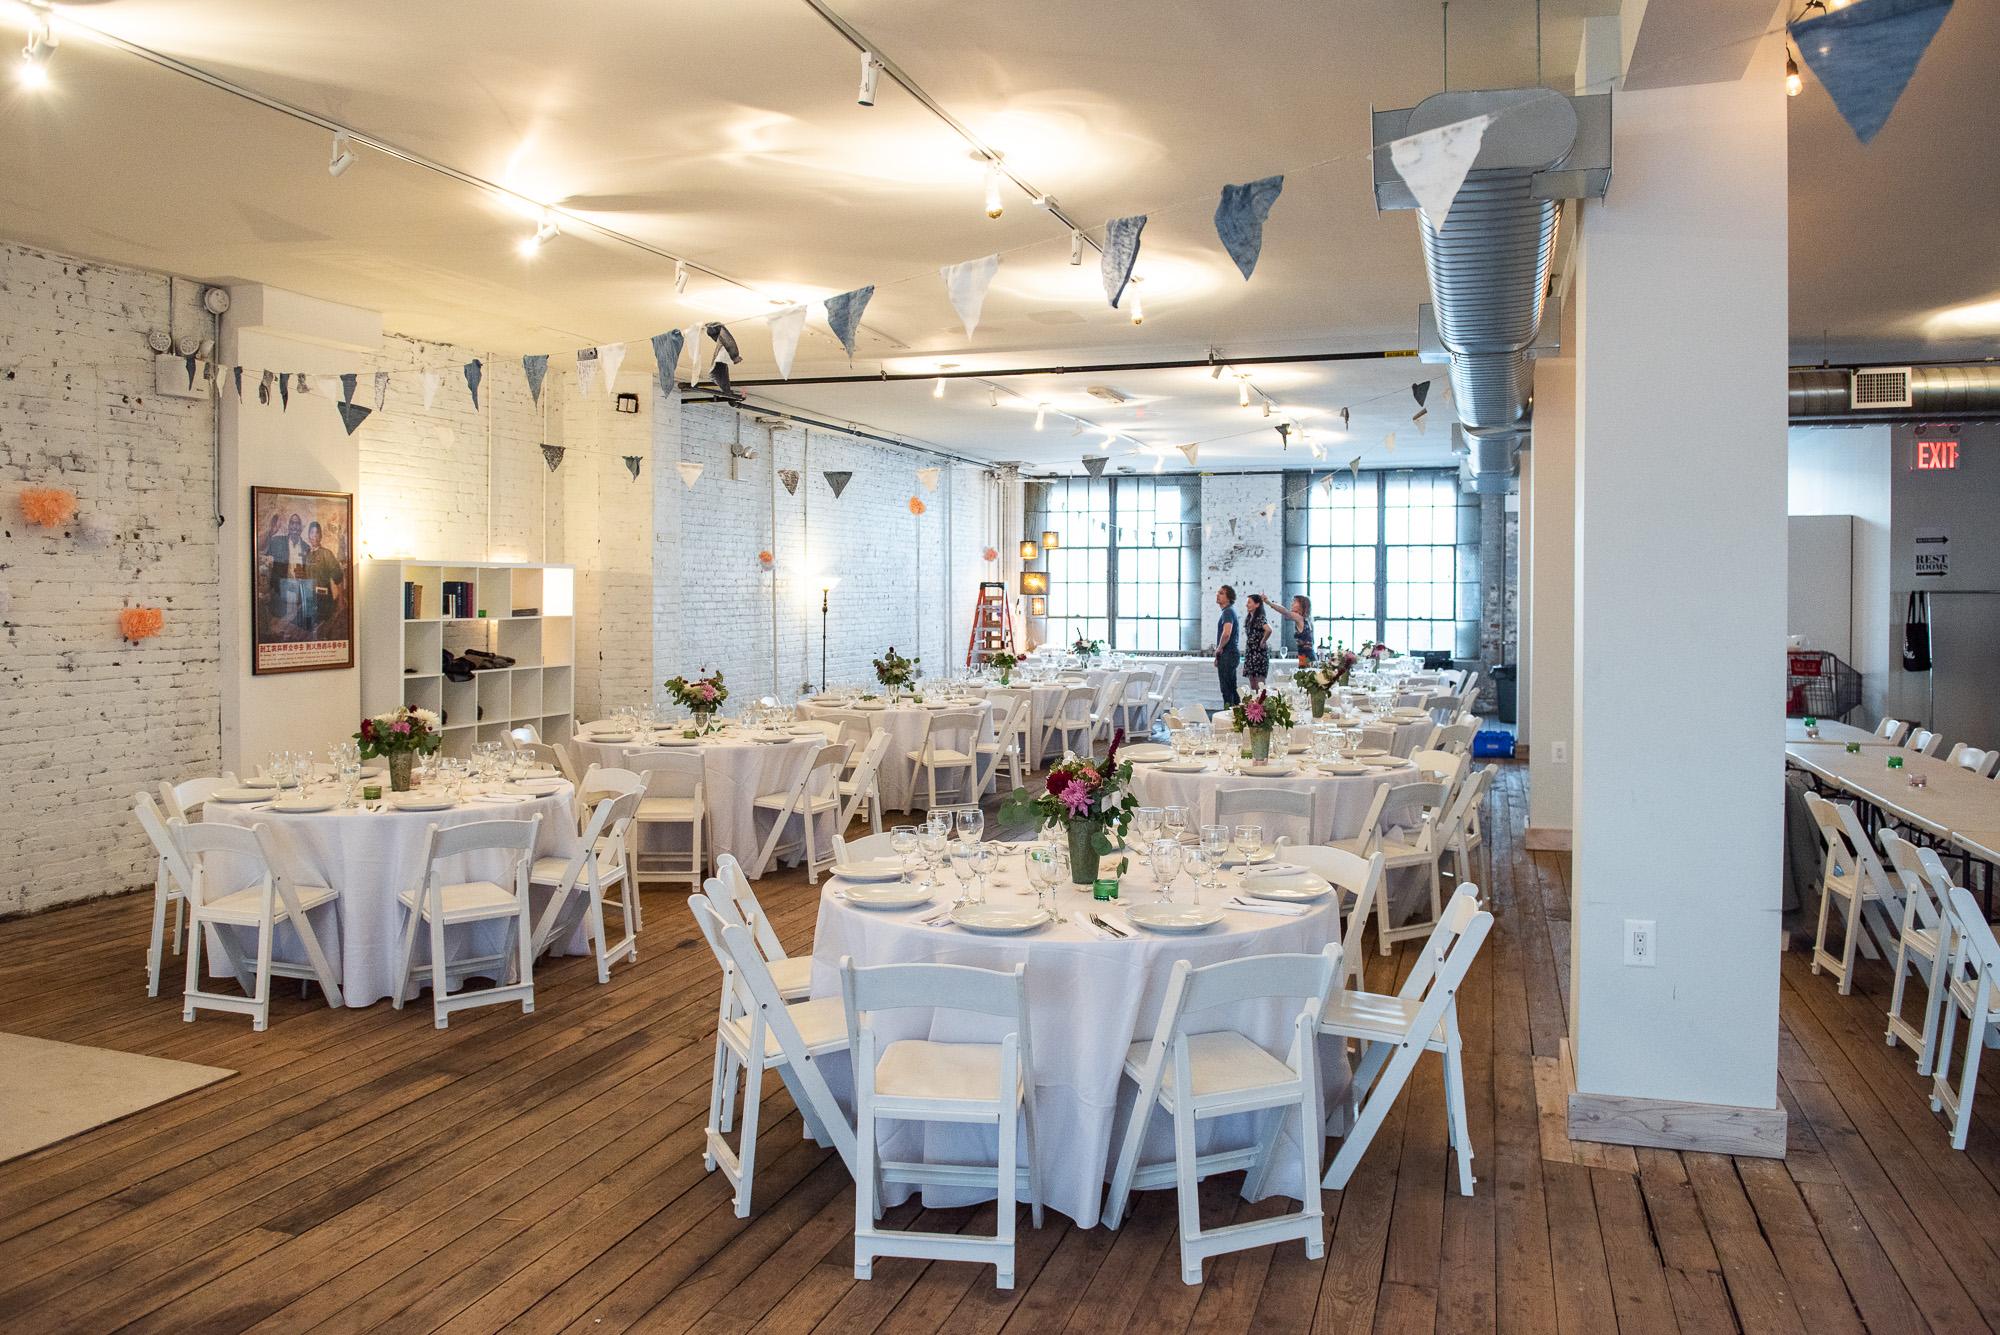 171104_events_wedding_christina_mike_011.jpg